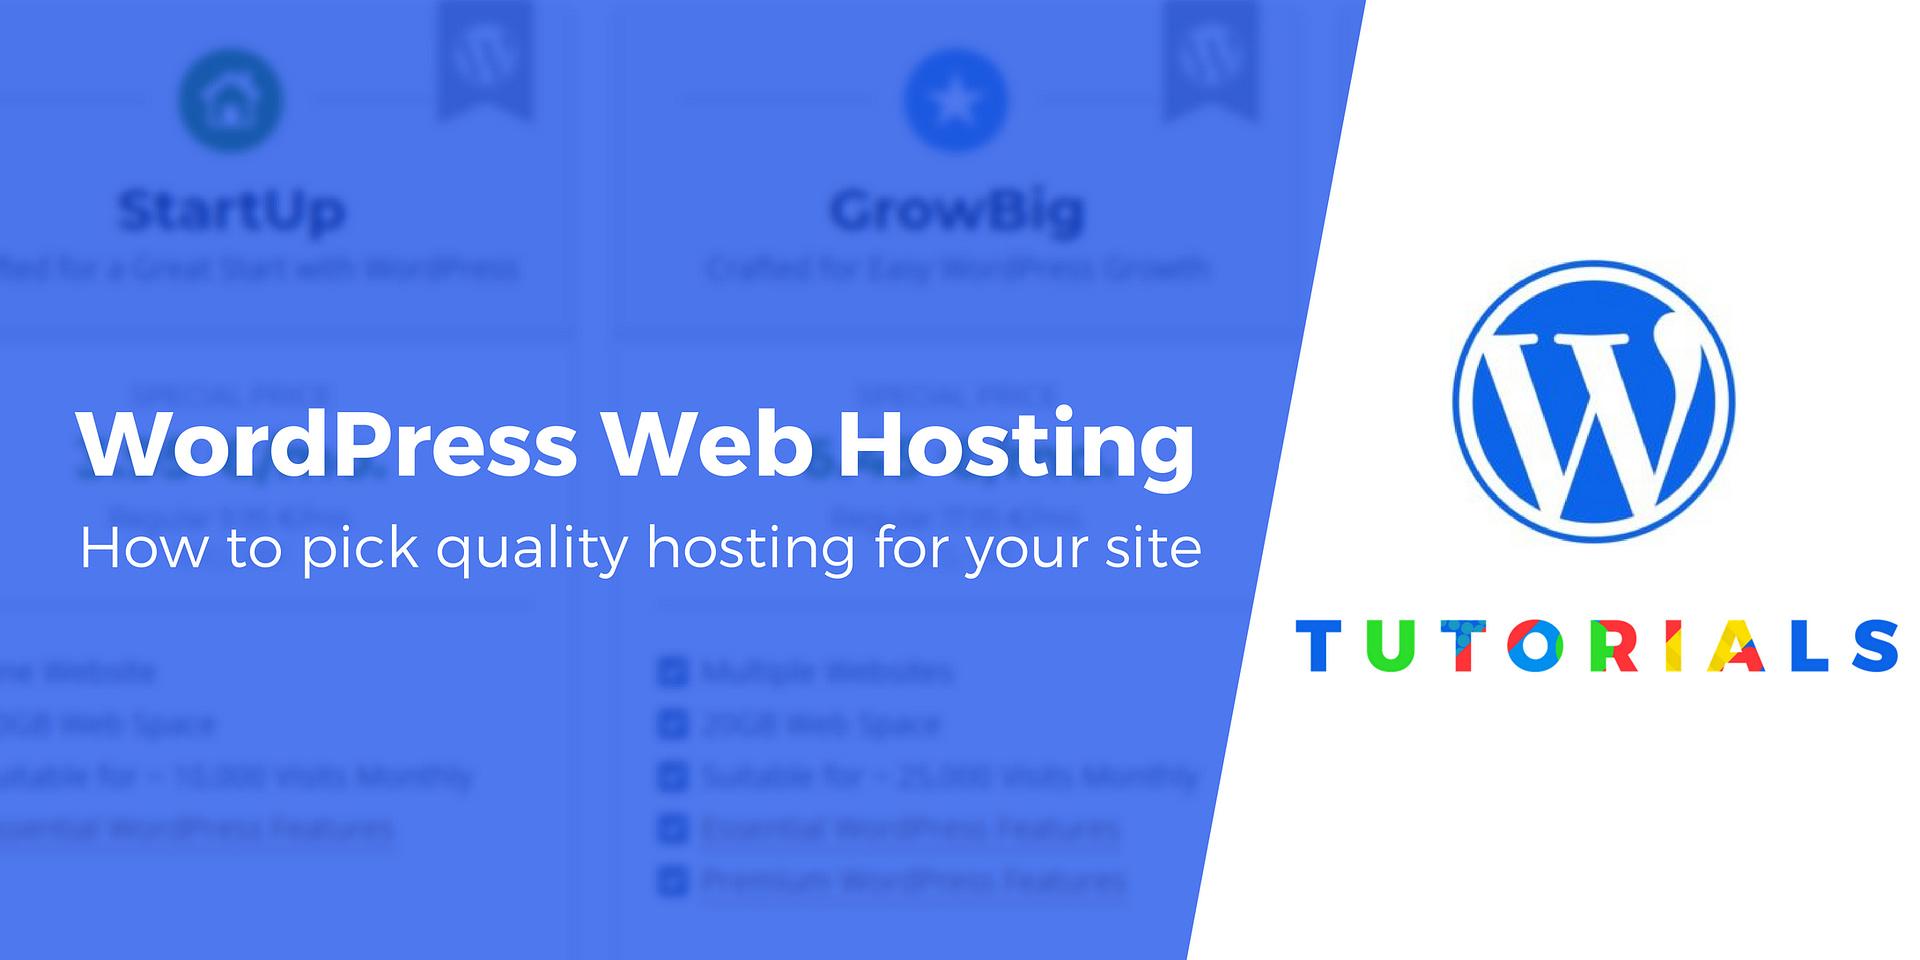 WordPress Web Hosting Company - How to Choose One